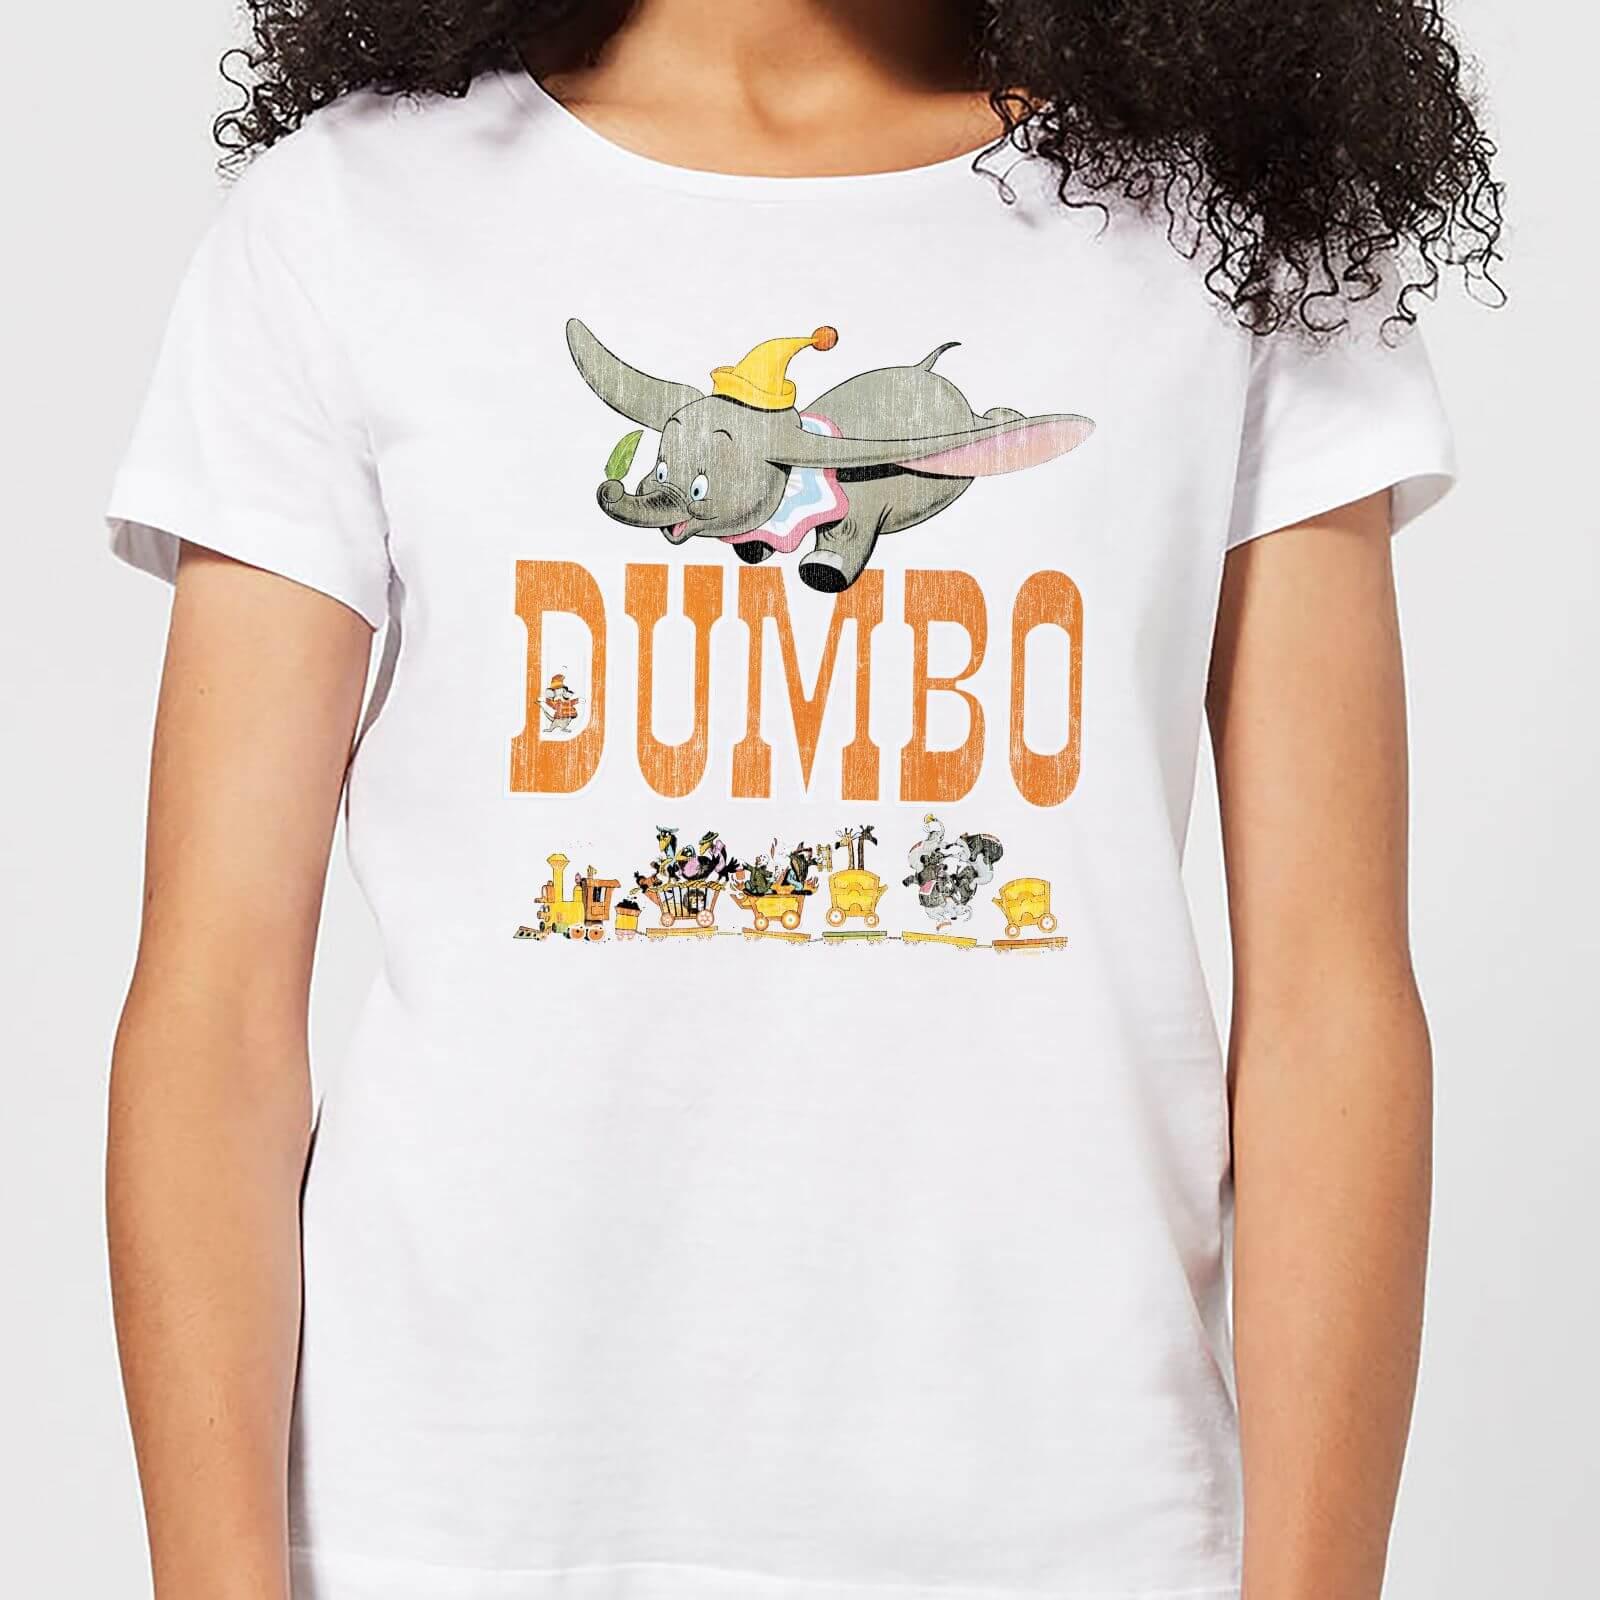 63bae3dd2a Dumbo The One The Only Damen T-Shirt - Weiß Bekleidung | Zavvi.de